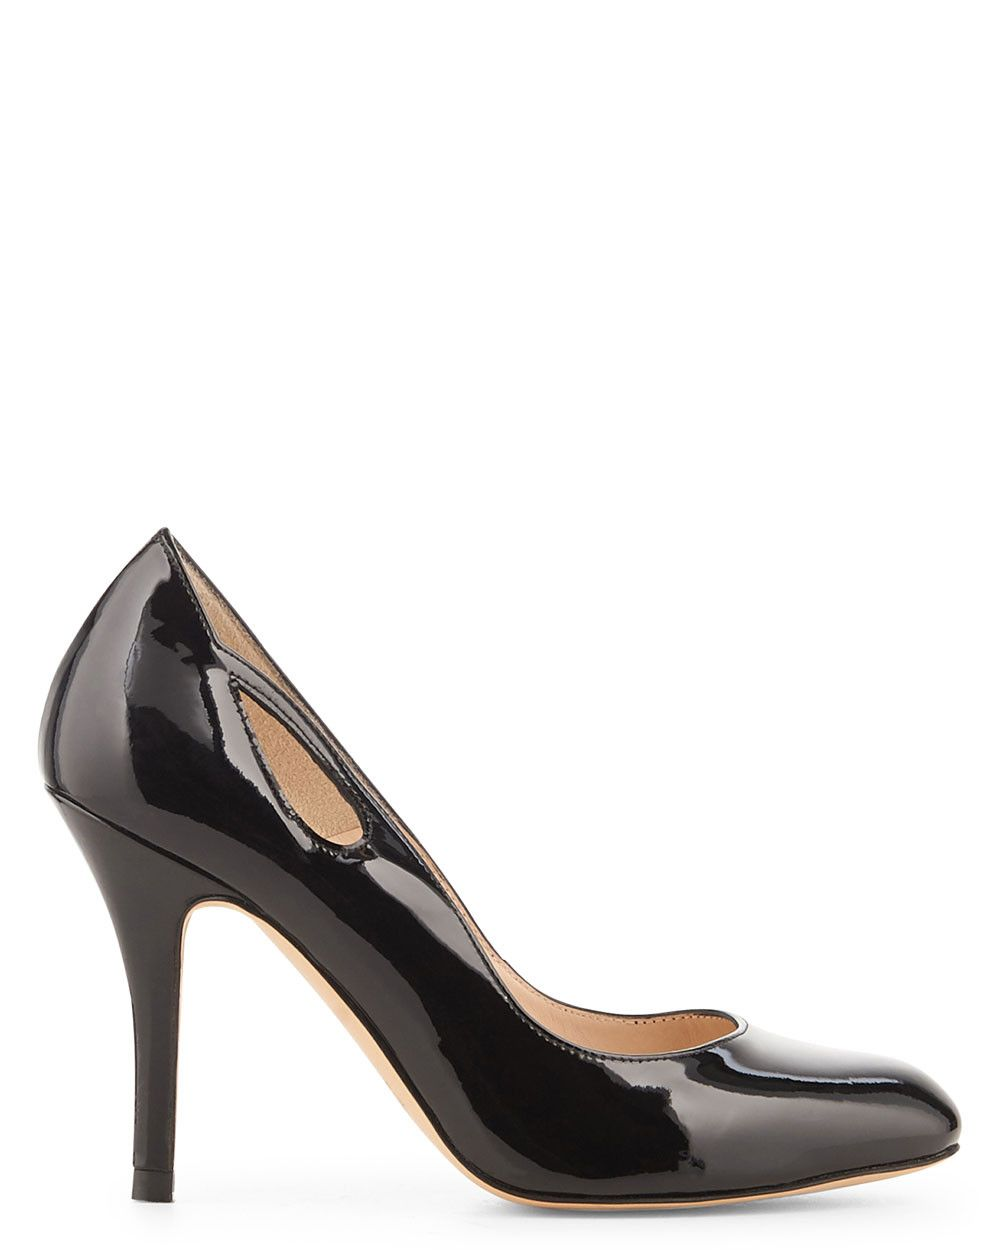 Escarpin - June - Escarpins Femme cuir vernis - Minelli